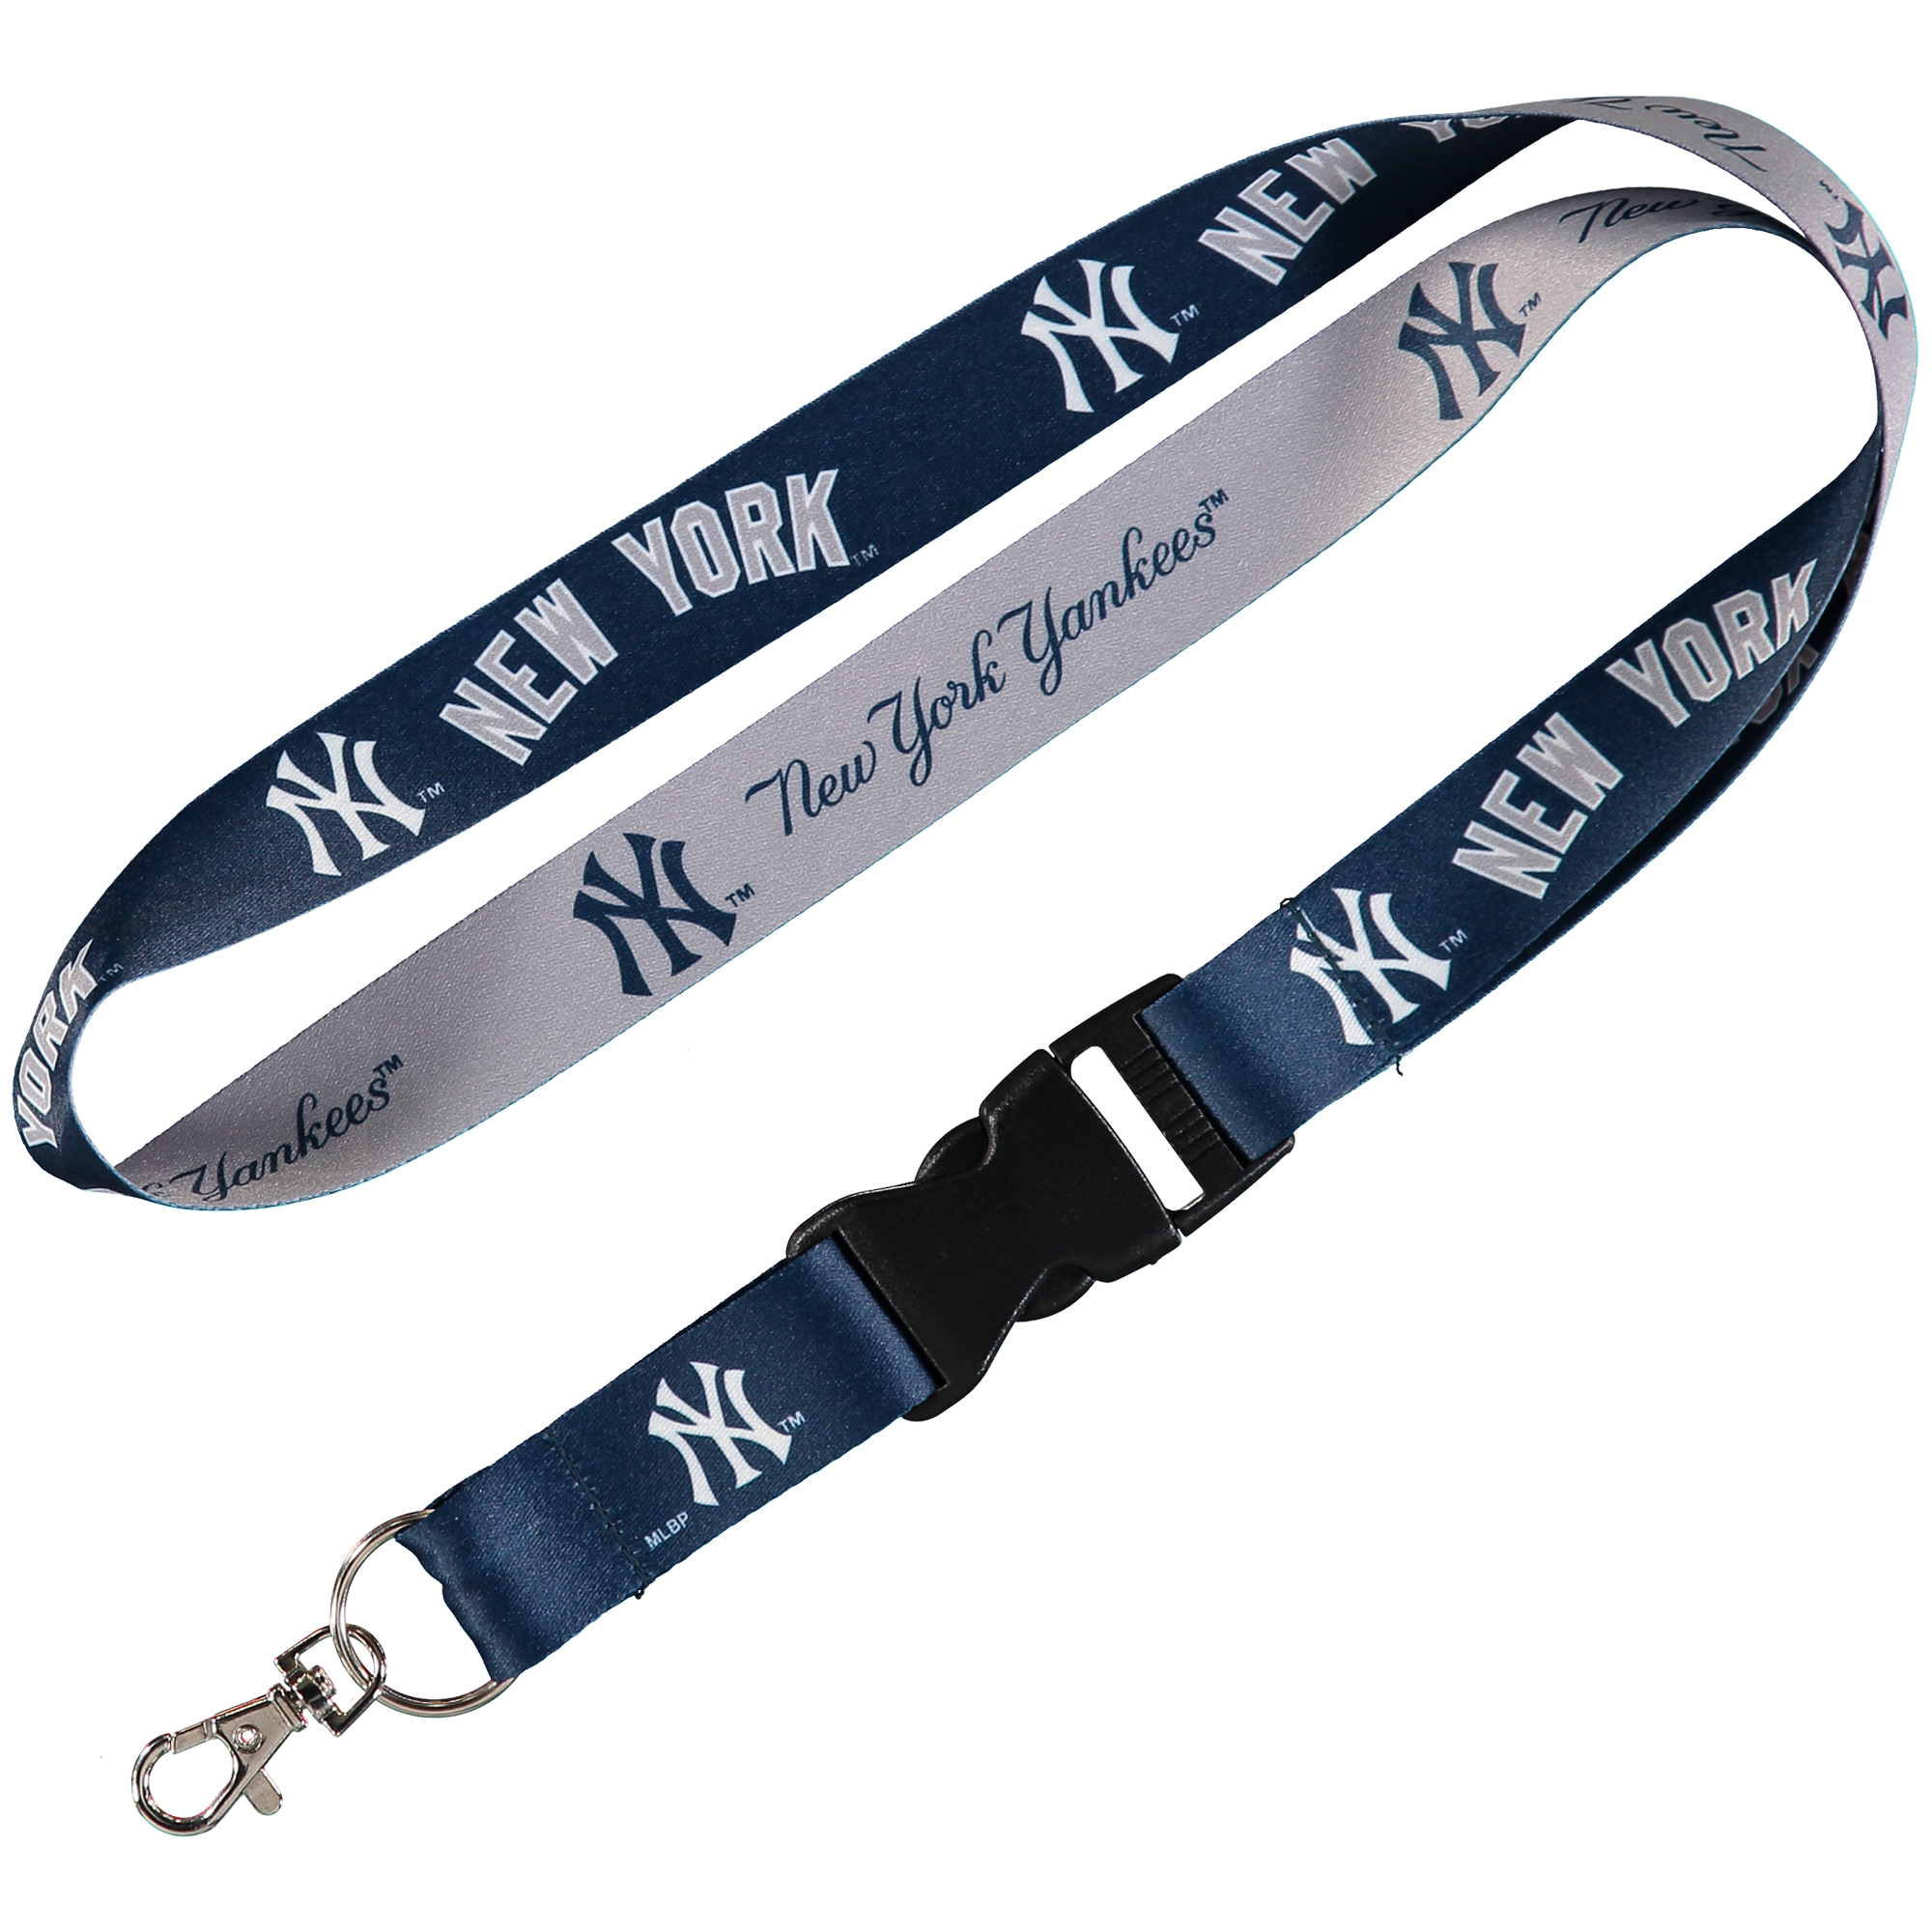 New York Yankees WinCraft Wordmark Lanyard with Detachable Buckle - No Size